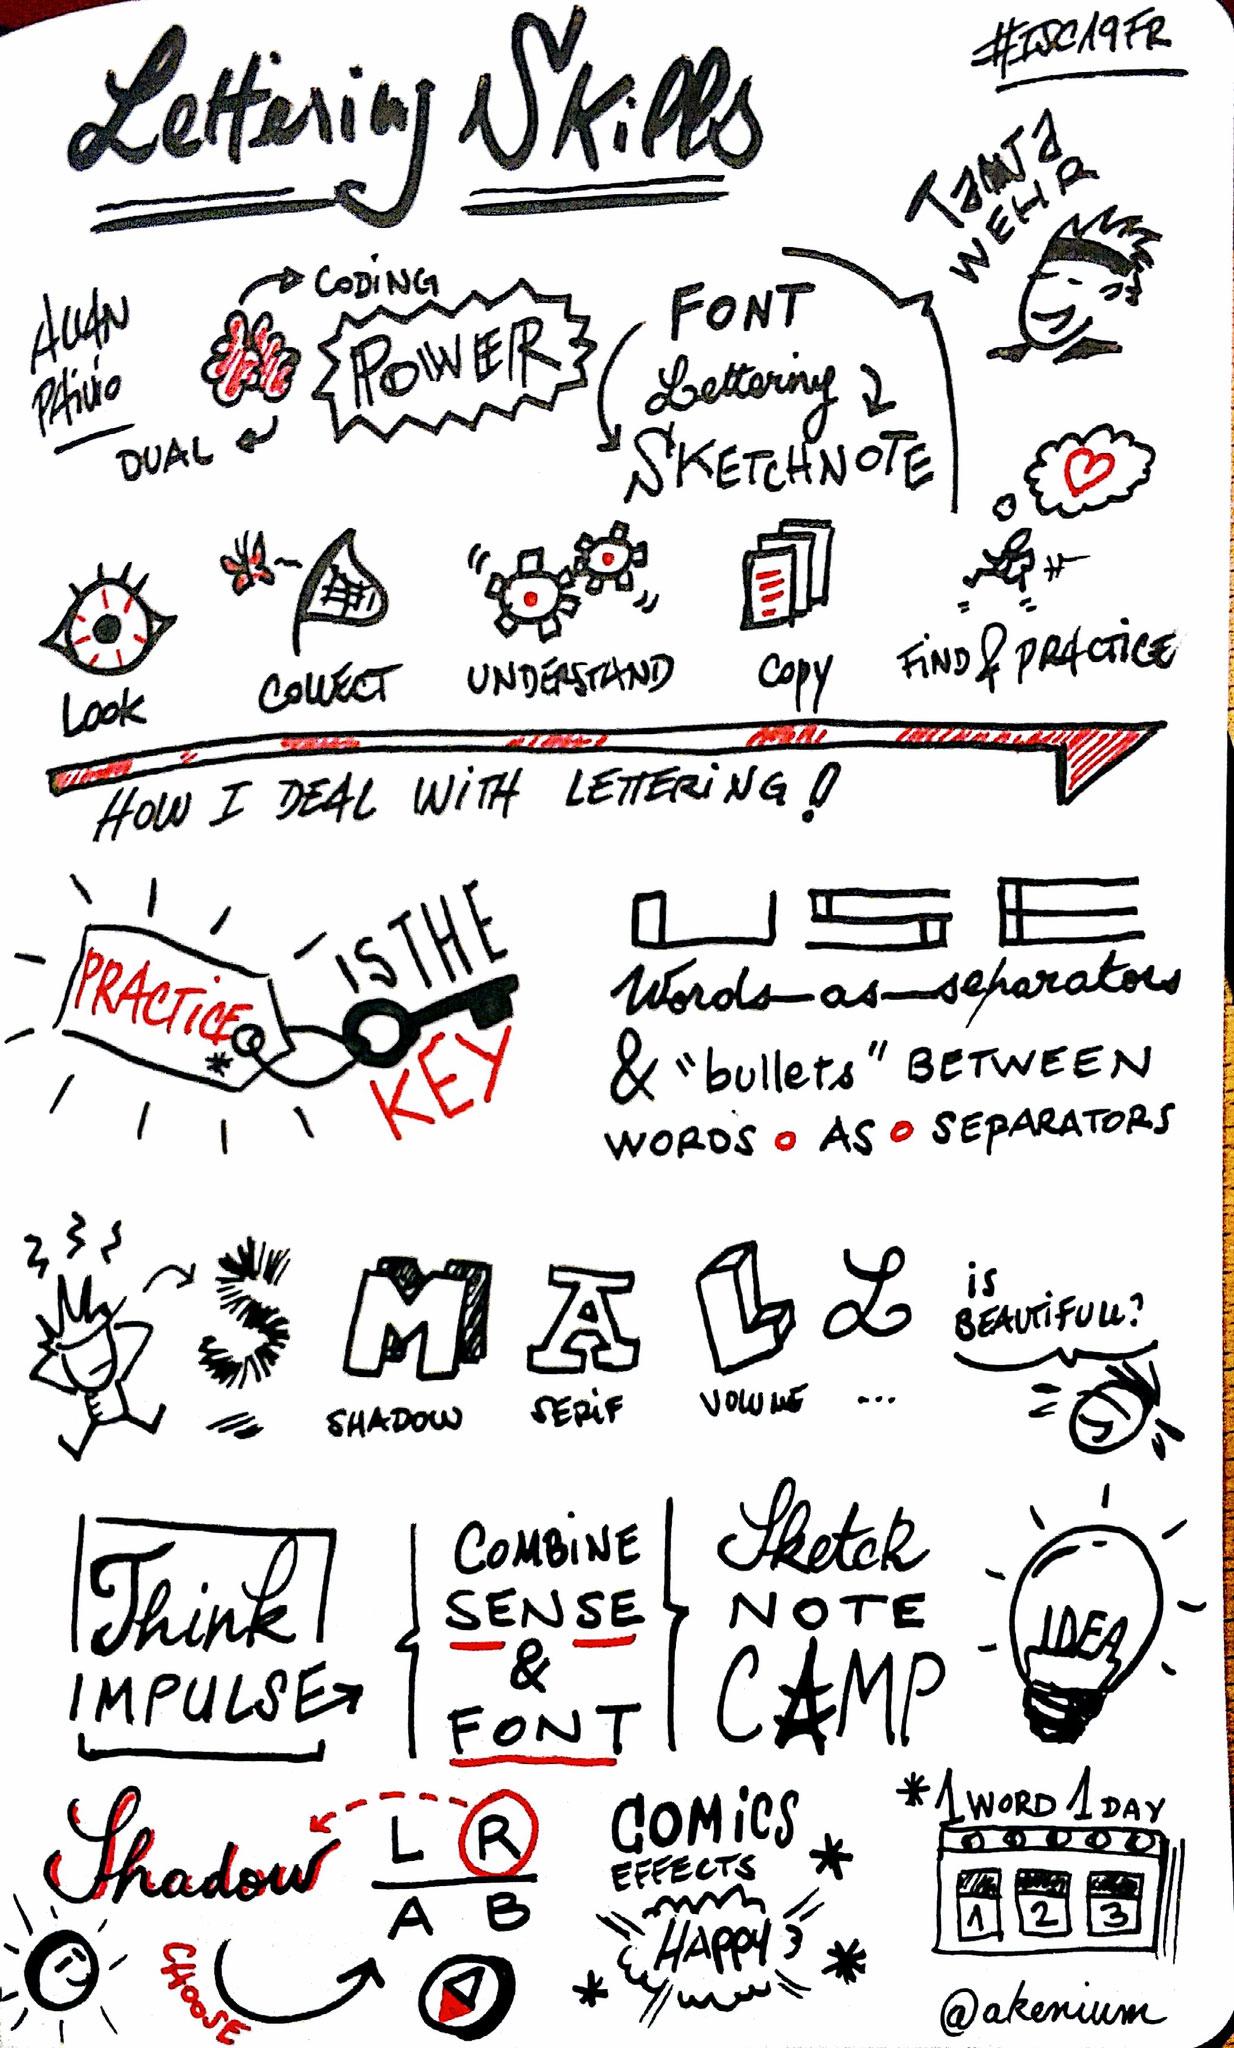 Tanja Wehr : Lettering Skills